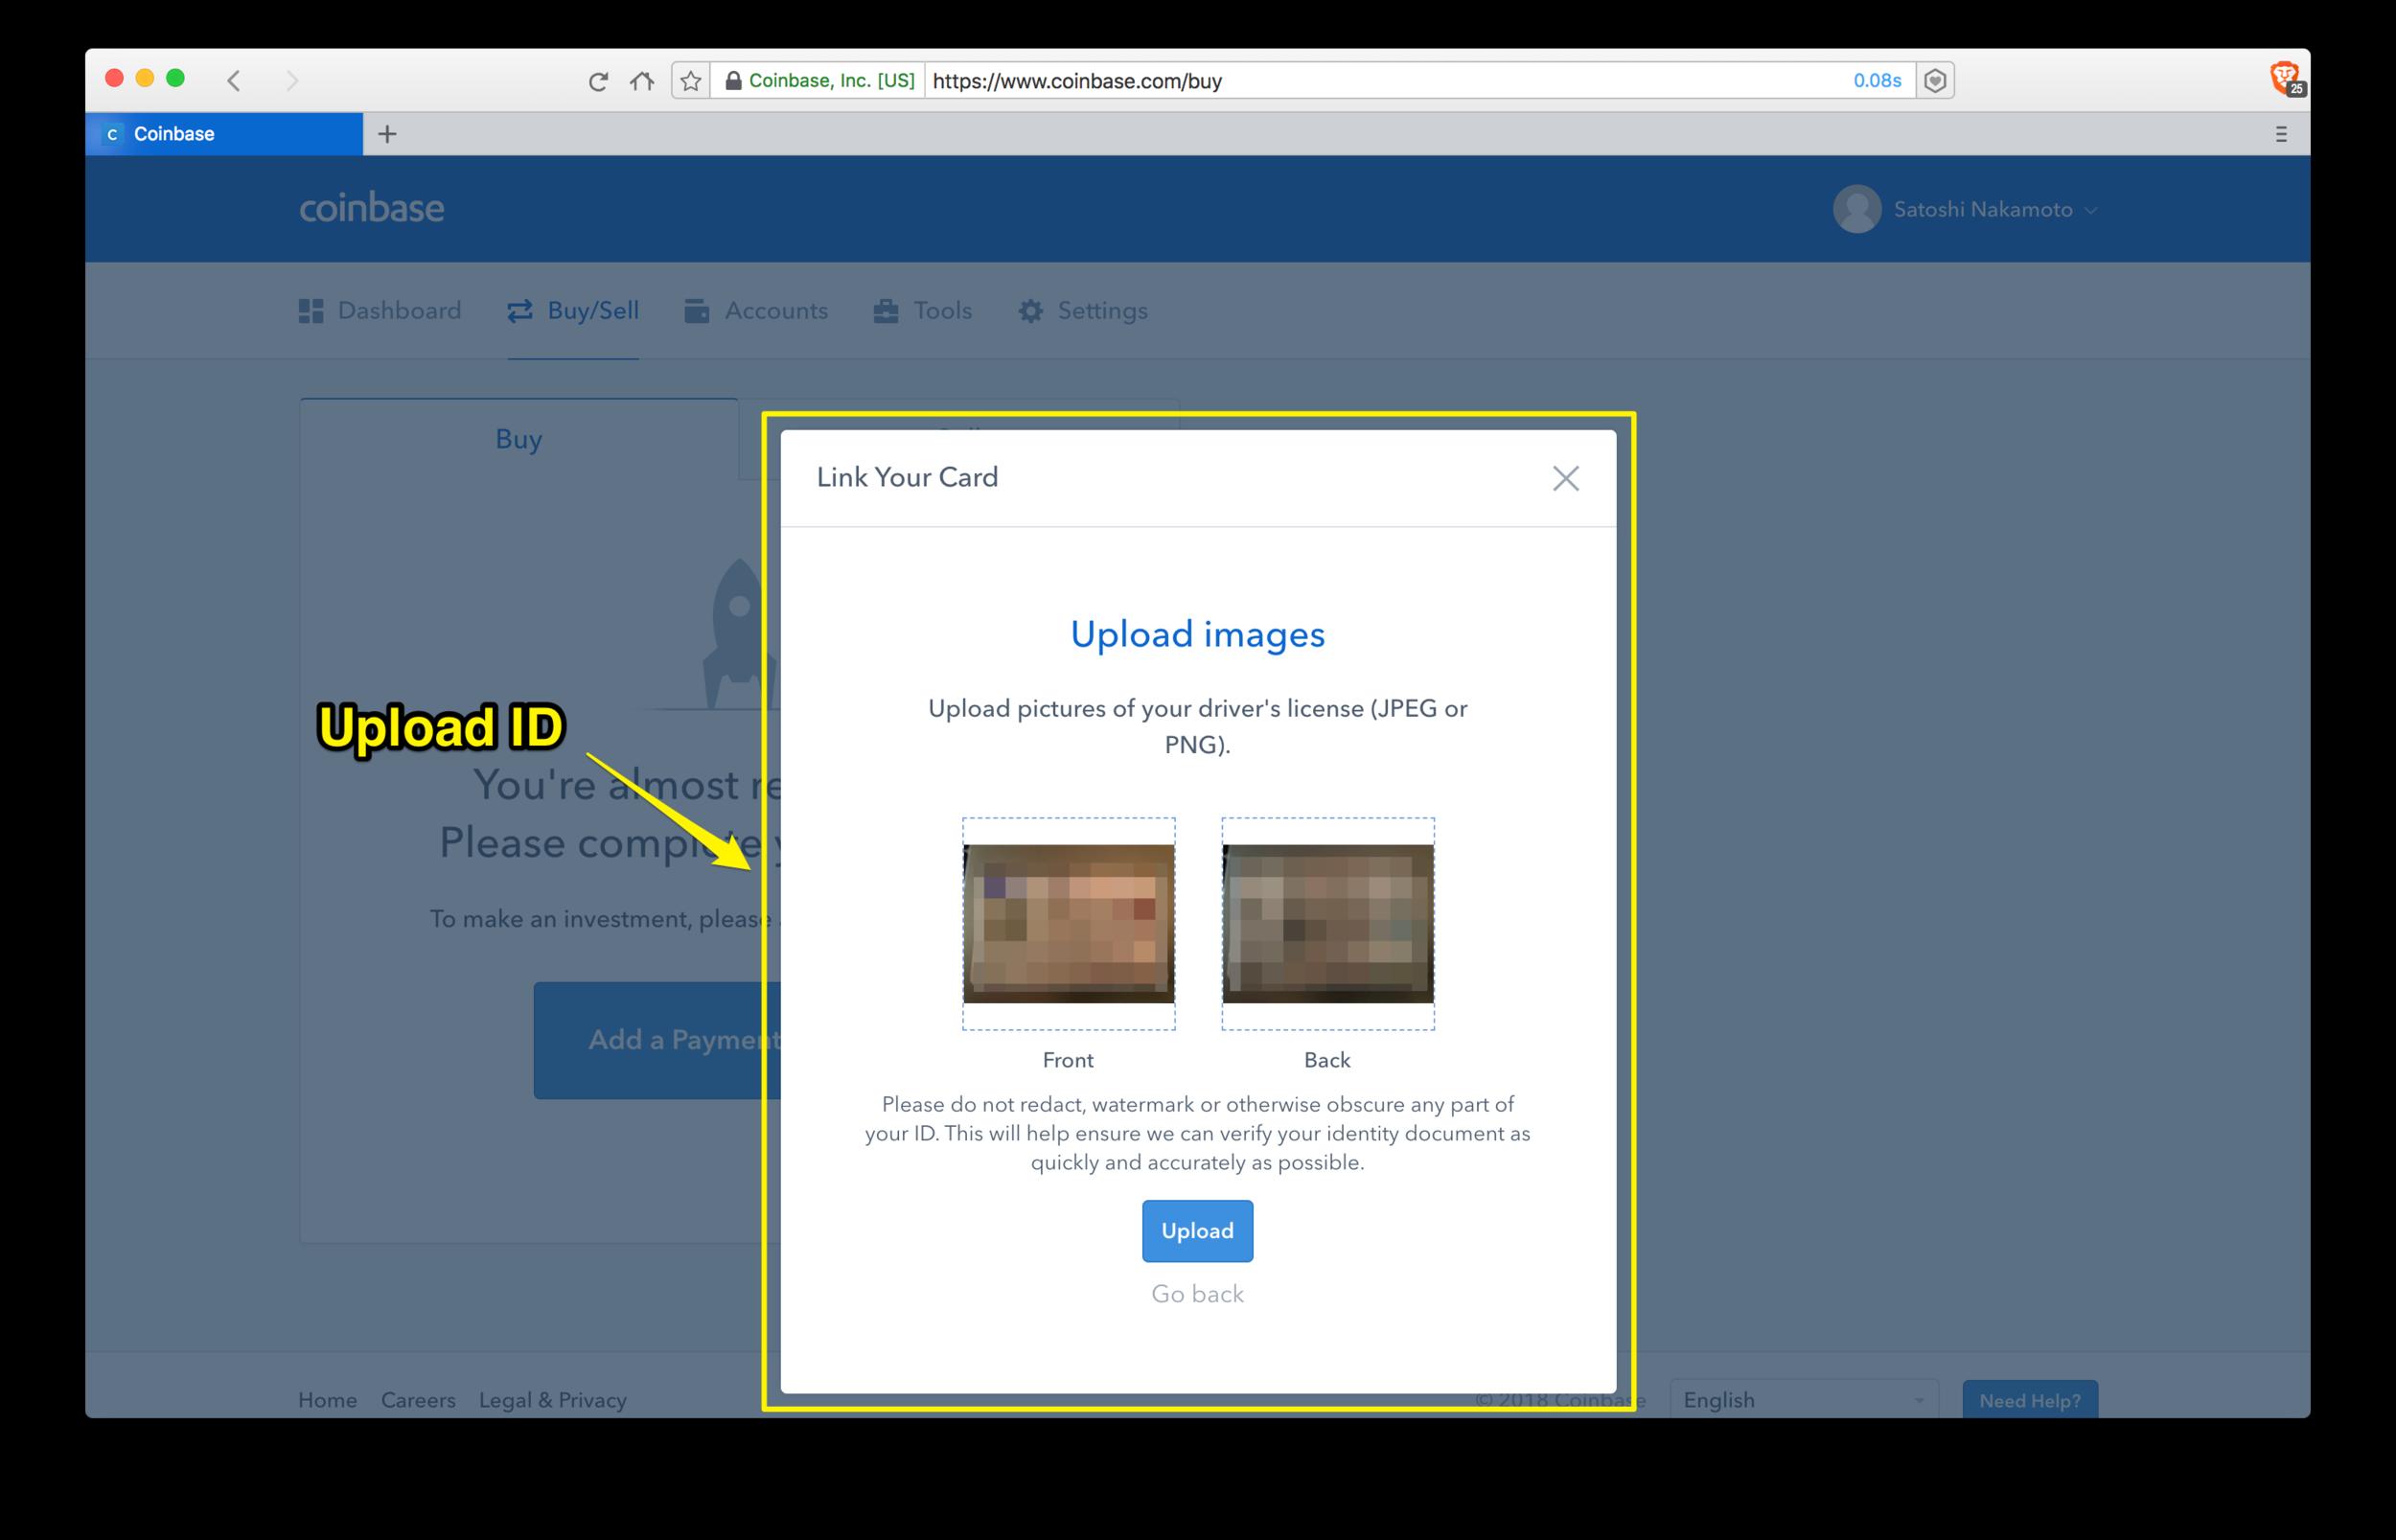 Coinbase: upload ID